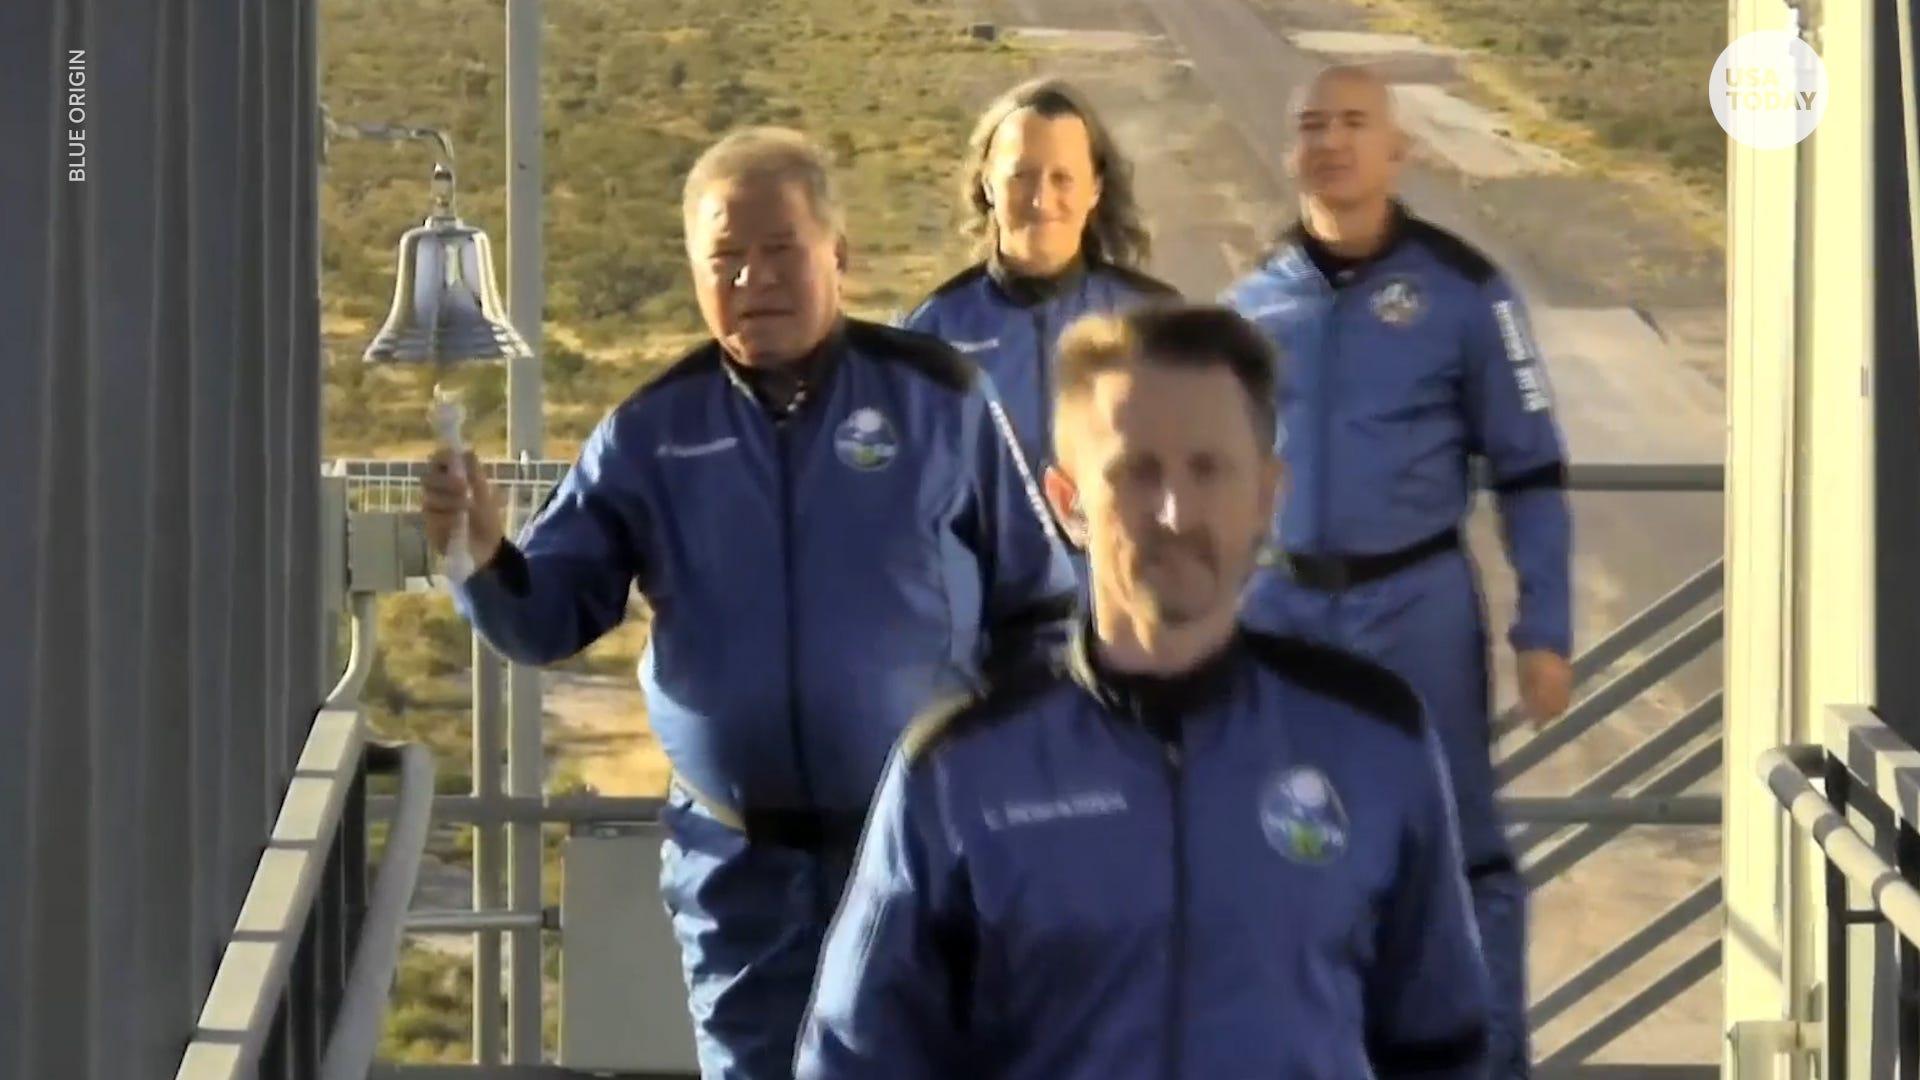 Star Trek  actor William Shatner becomes oldest man in space aboard Blue Origin rocket